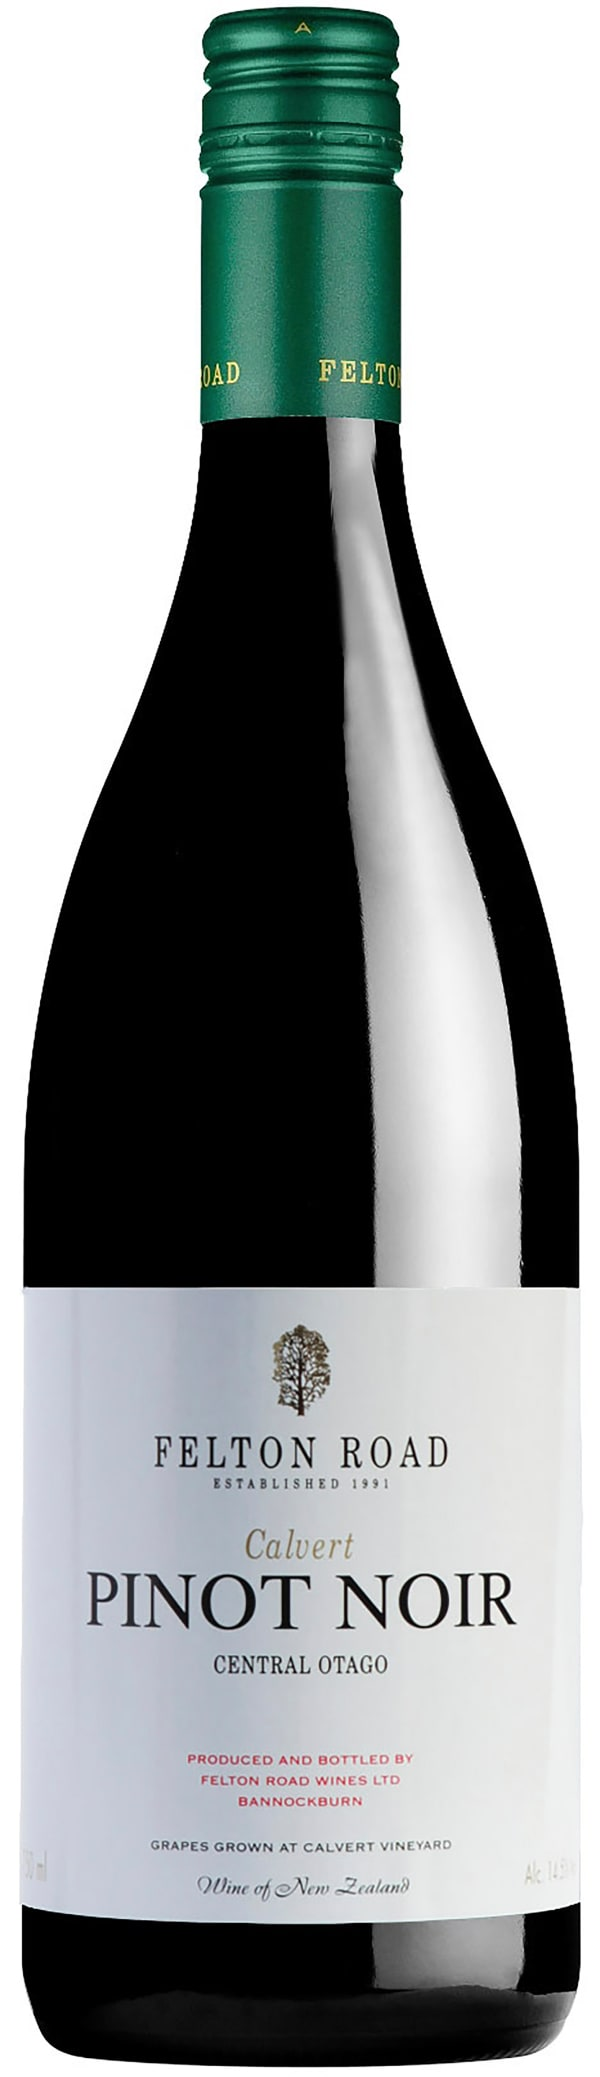 Felton Road Calvert Pinot Noir 2016